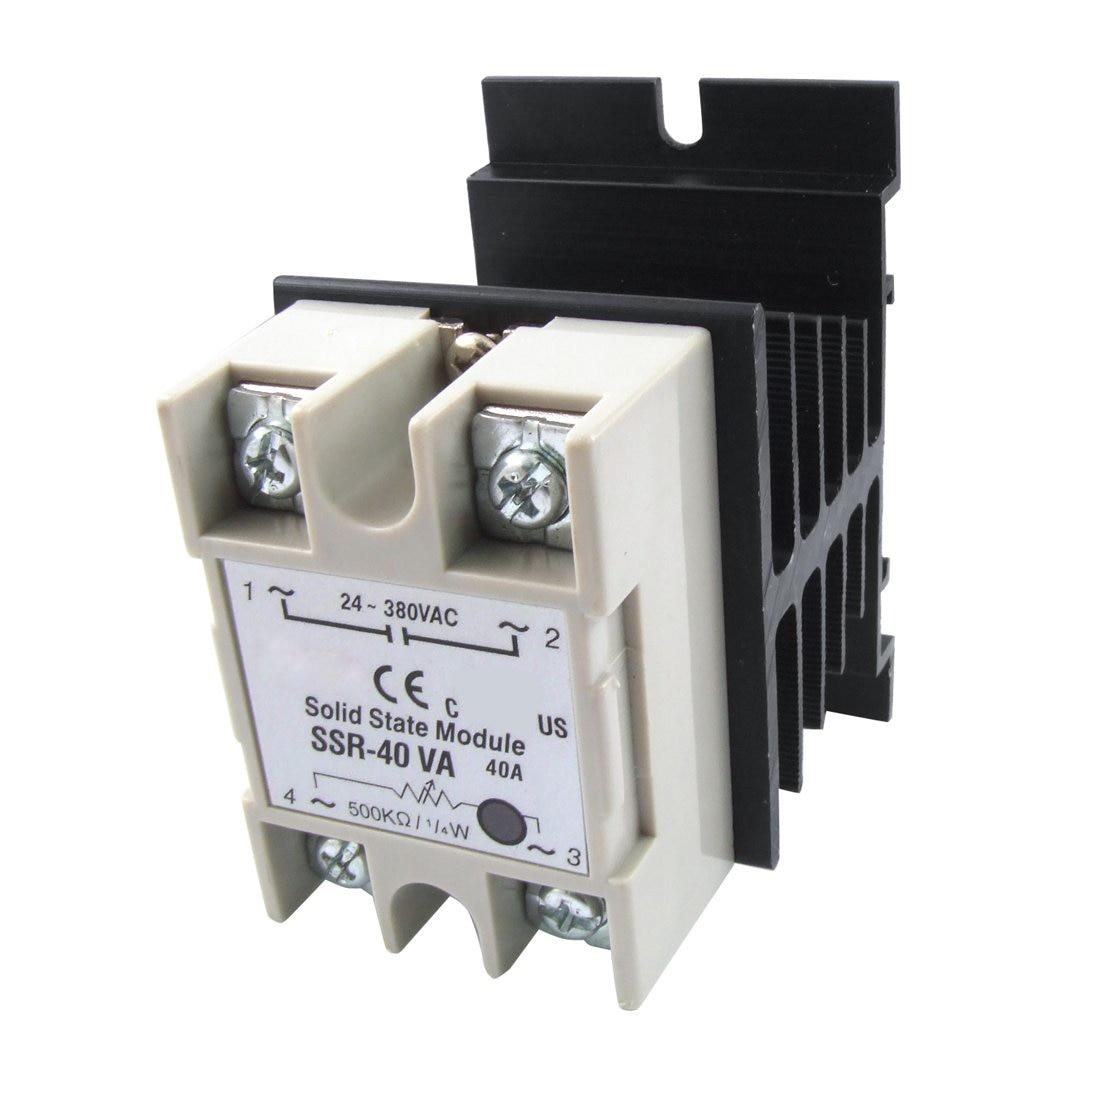 Regulador de resistencia de voltaje LHLL relé de estado sólido SSR 40A 24-380V AC w disipador de calor